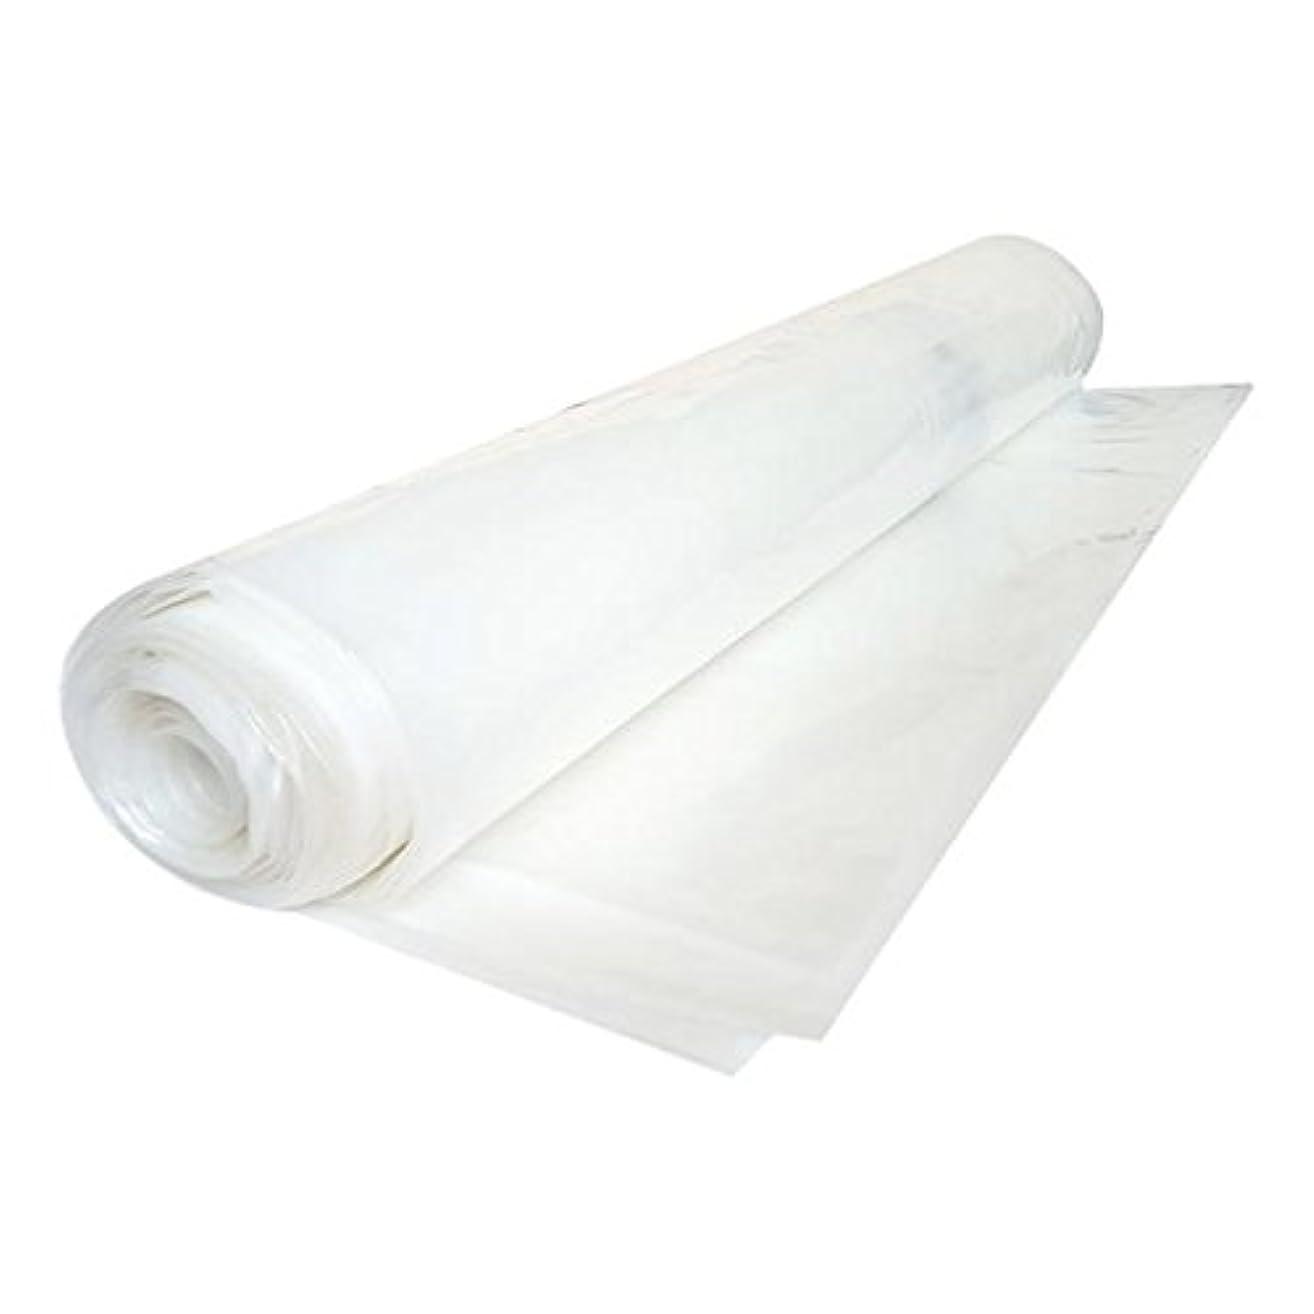 Bootstrap Farmer Greenhouse Plastic 6 mil UV Resistant Clear Polyethylene Film